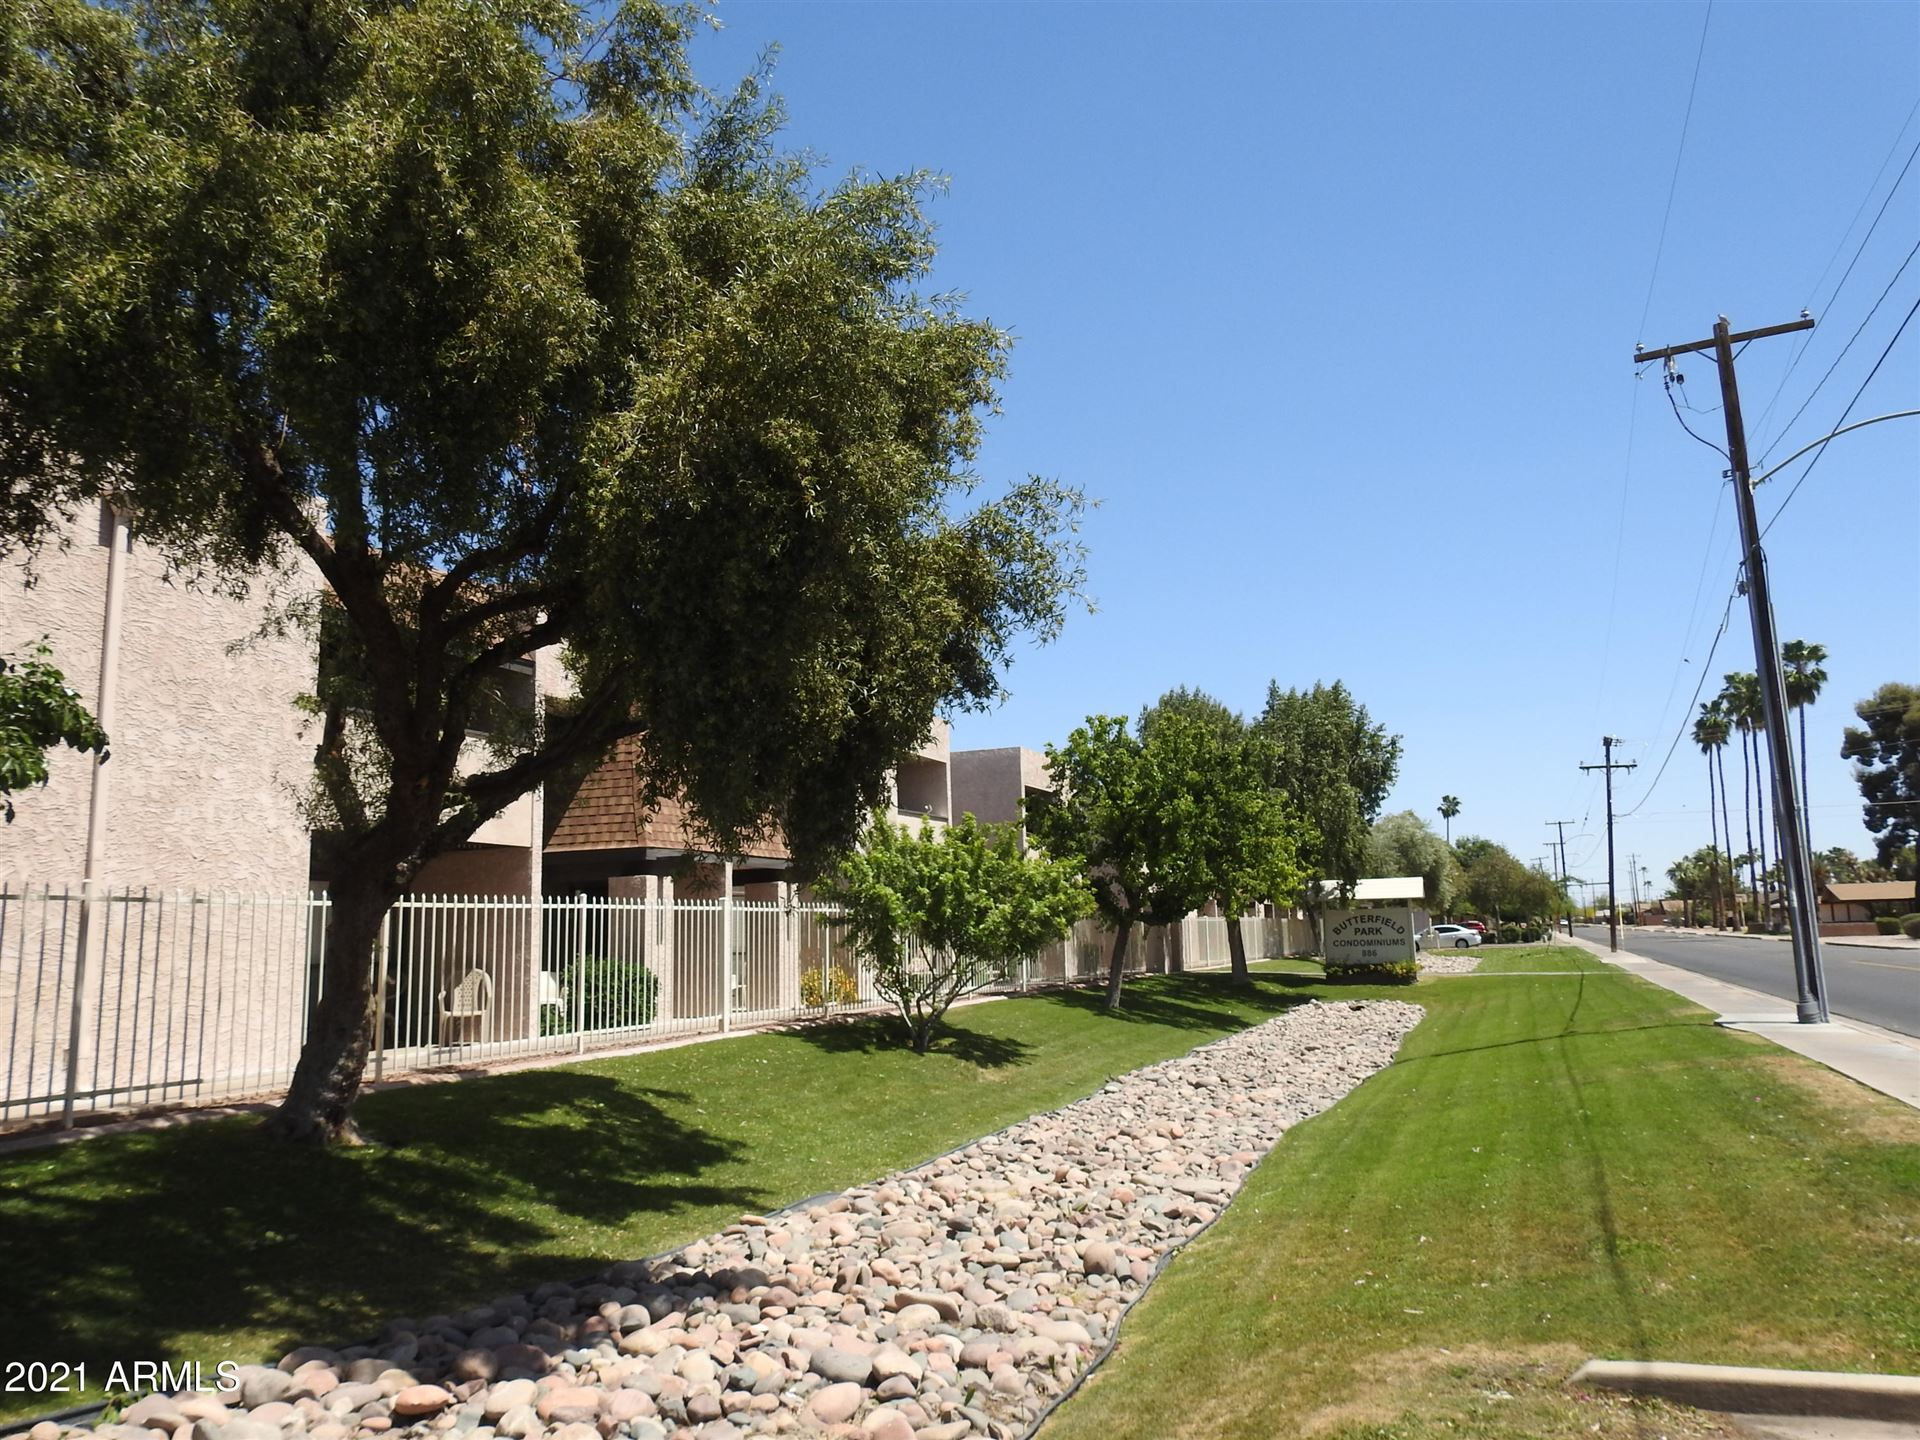 Photo of 886 W GALVESTON Street #216, Chandler, AZ 85225 (MLS # 6269023)